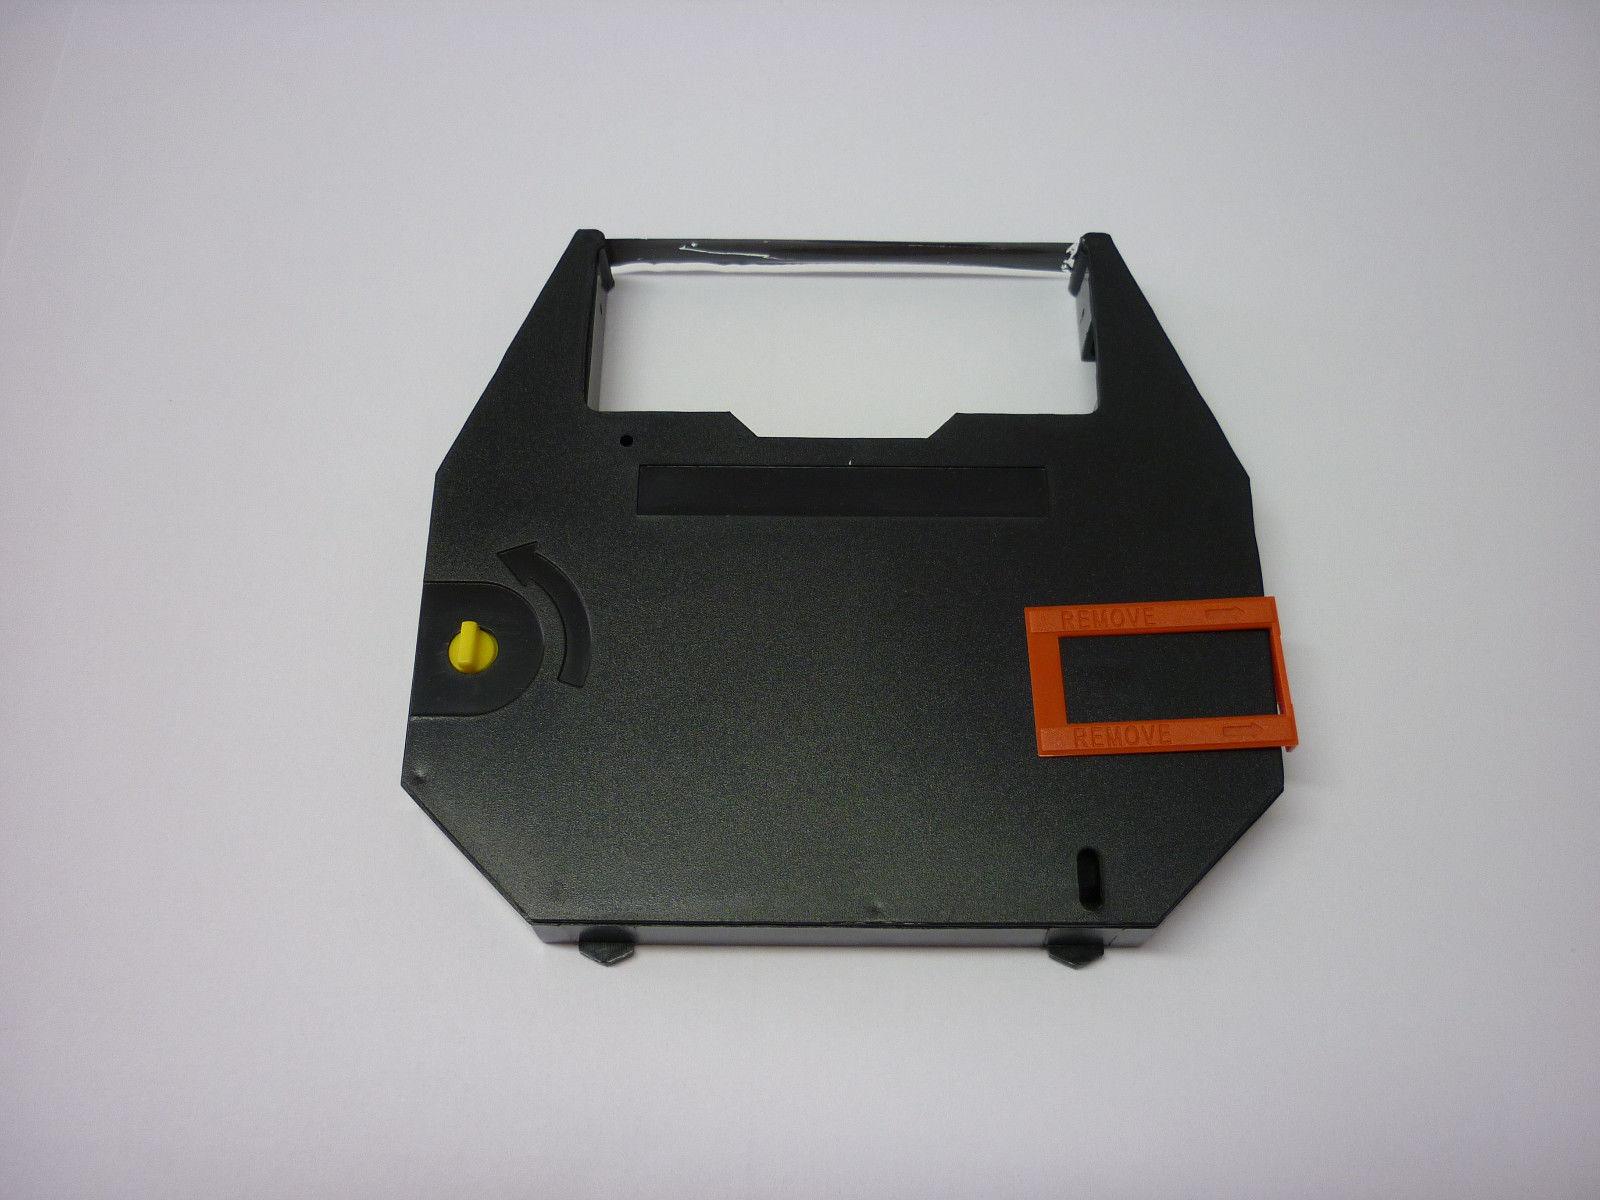 Swintec 20M 600 640 Typewriter Ribbon Correctable Replaces SWS 1045 (2 Pack)